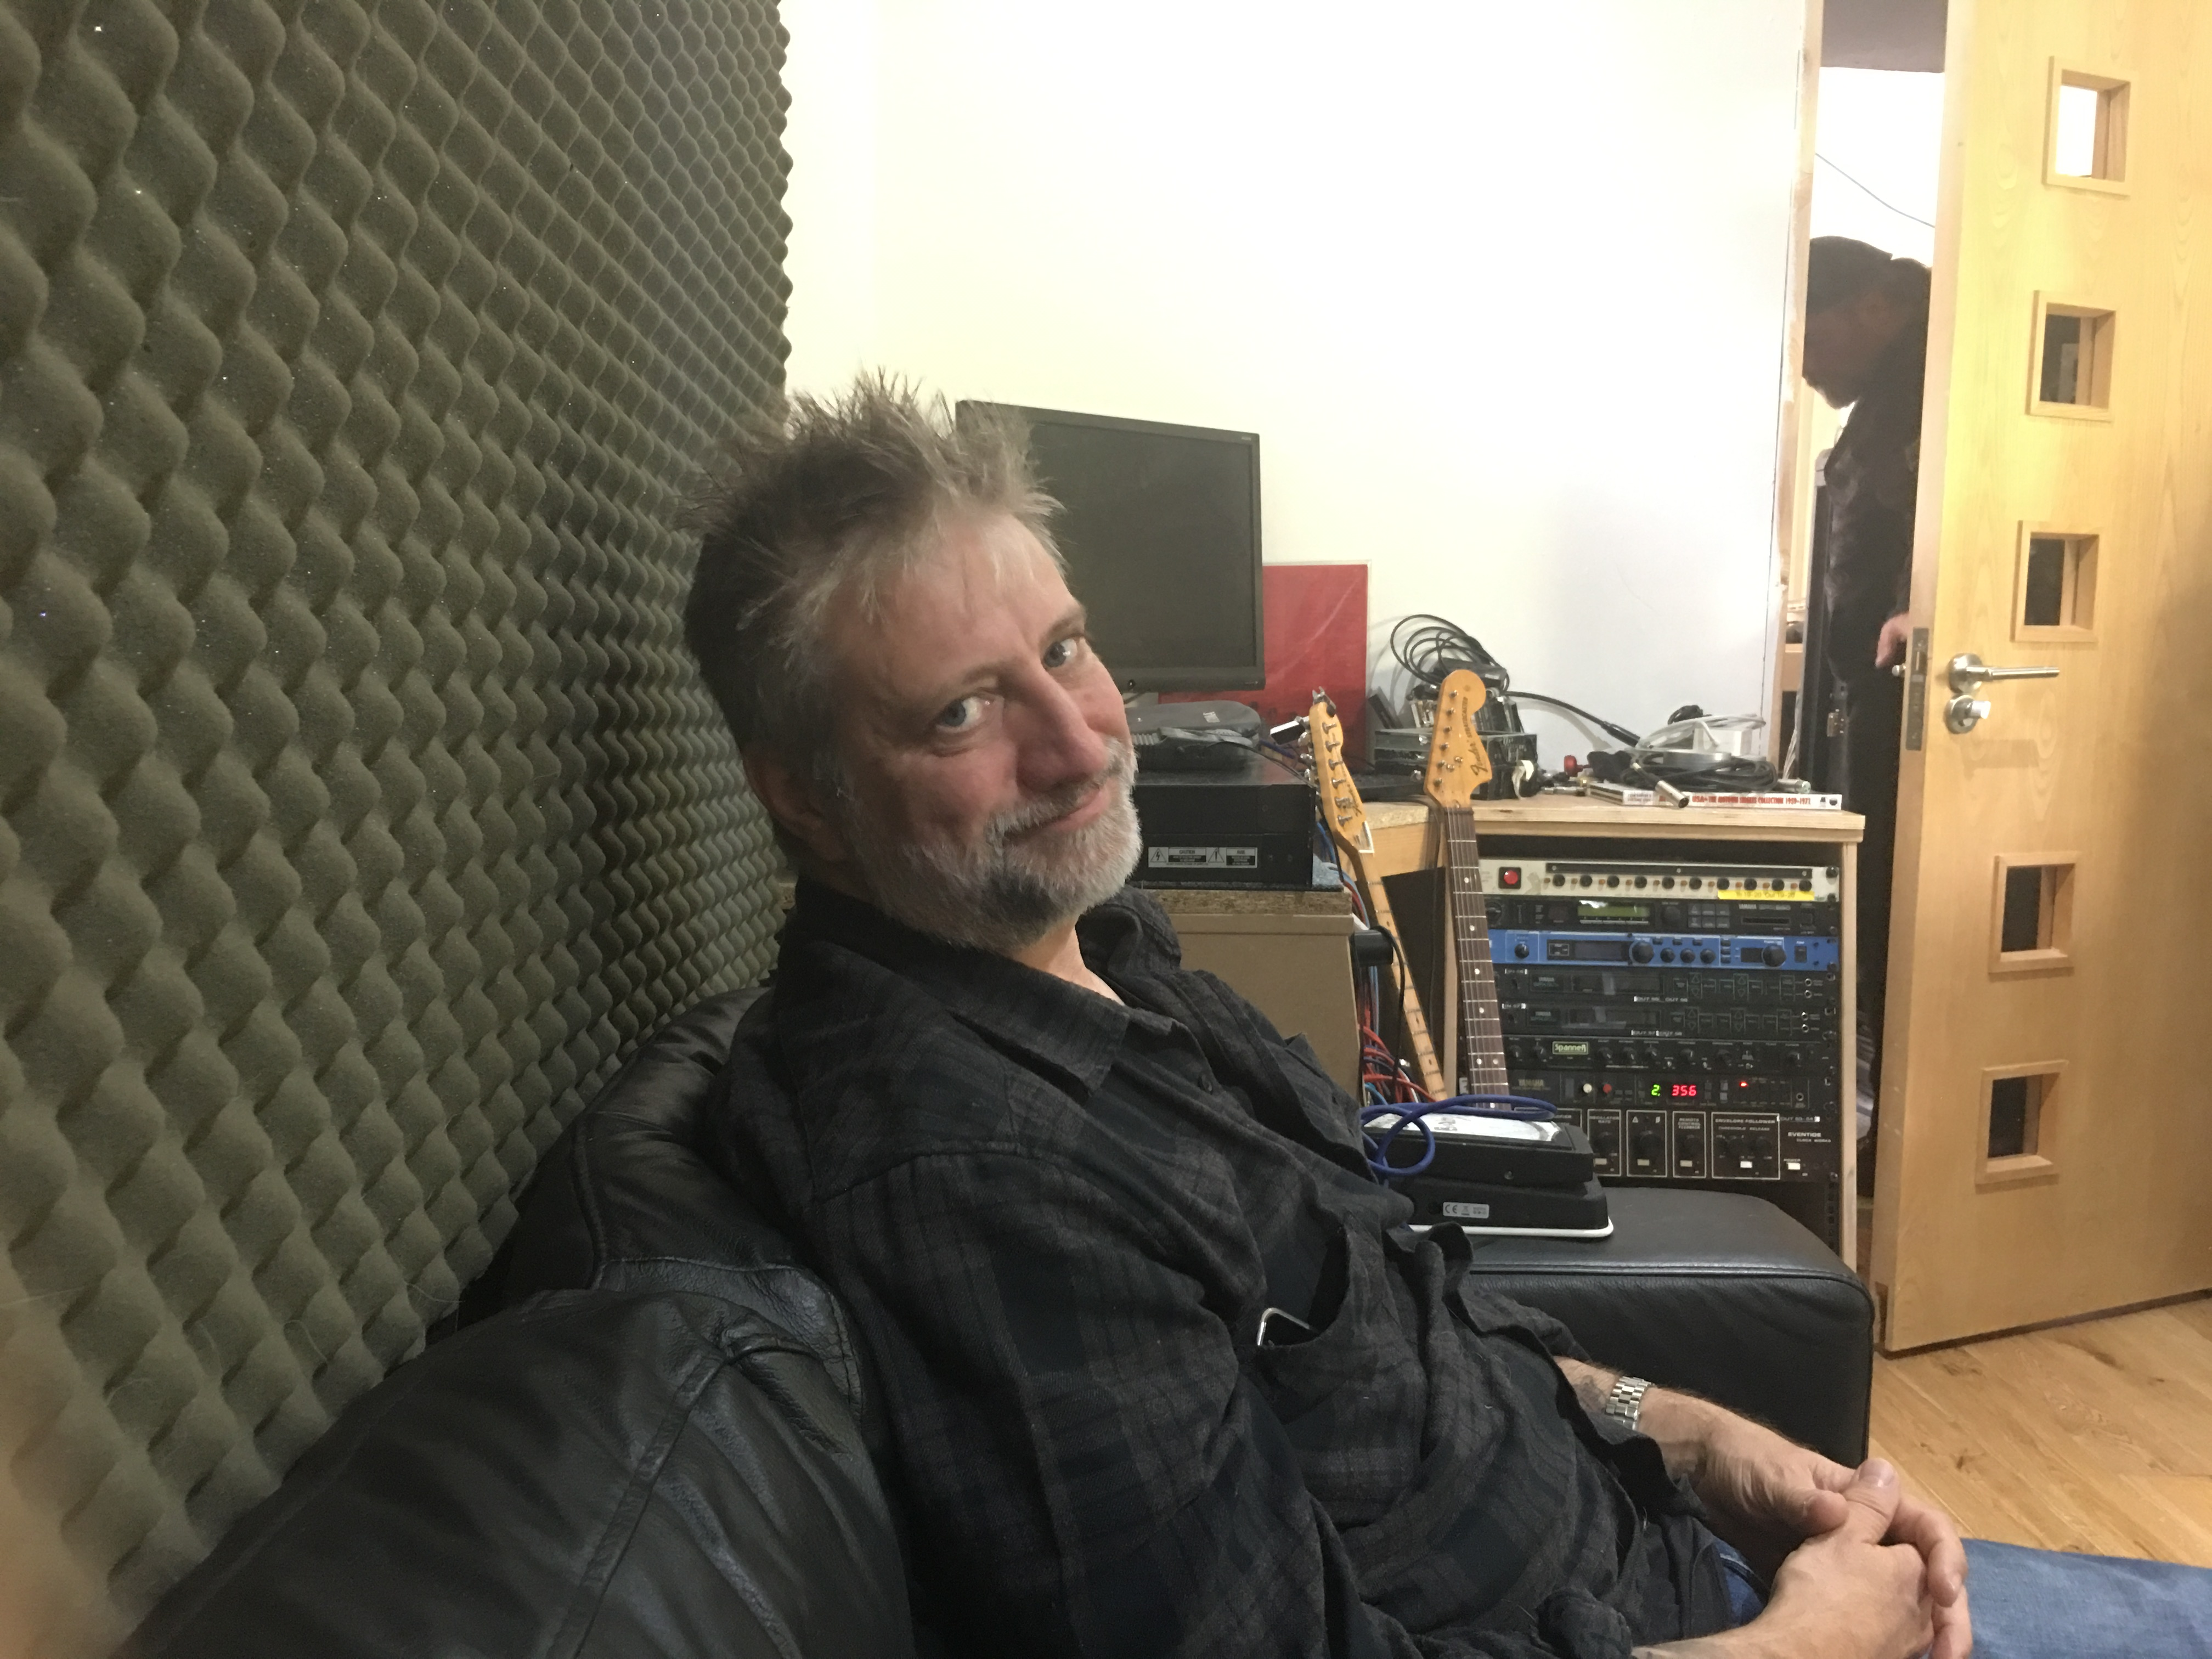 Studio (cabin fever)